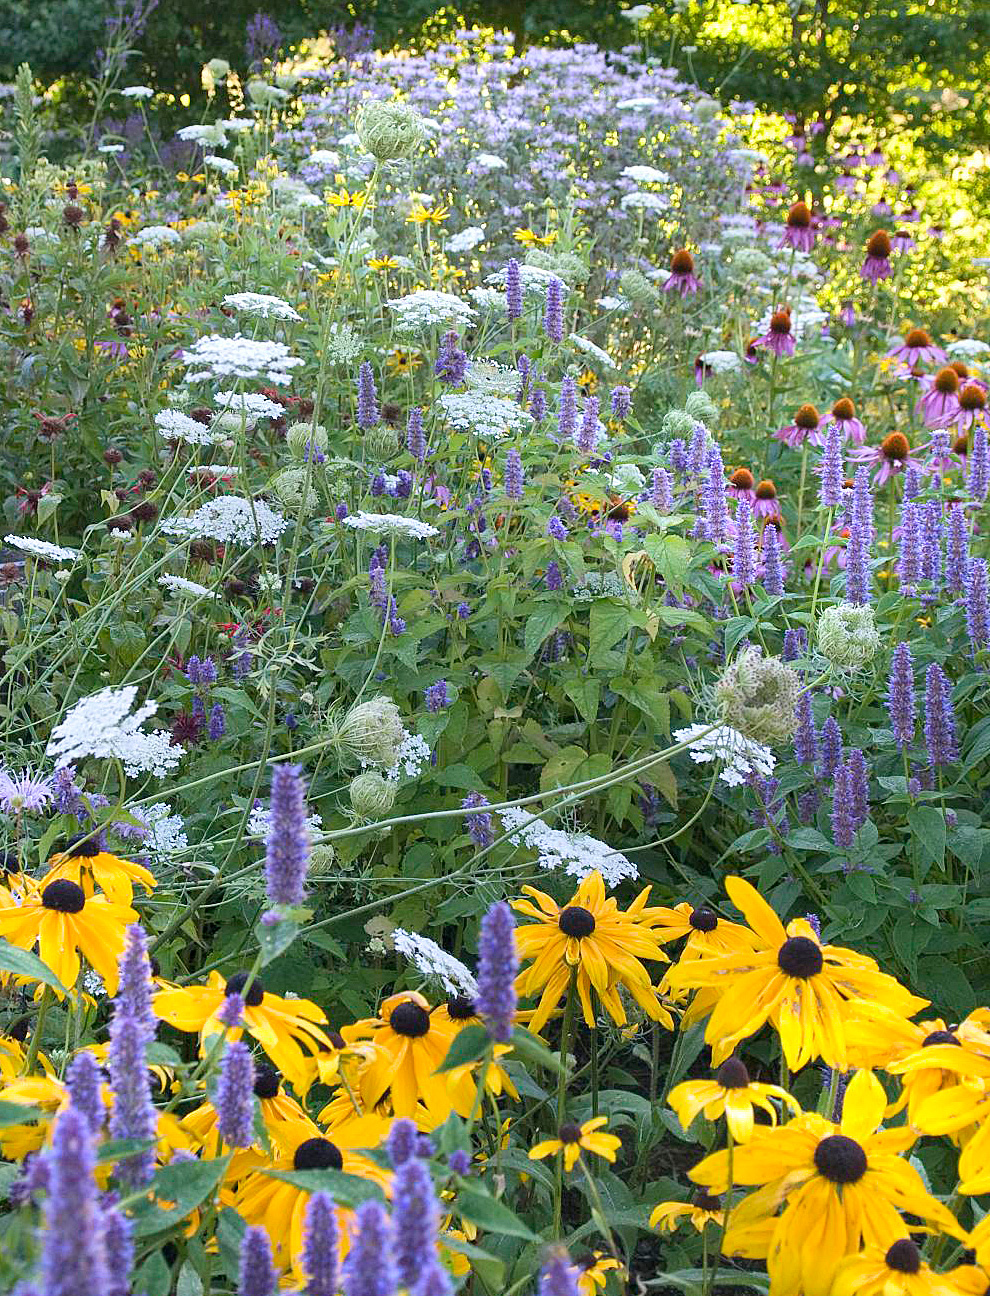 Go wild for wildflowers